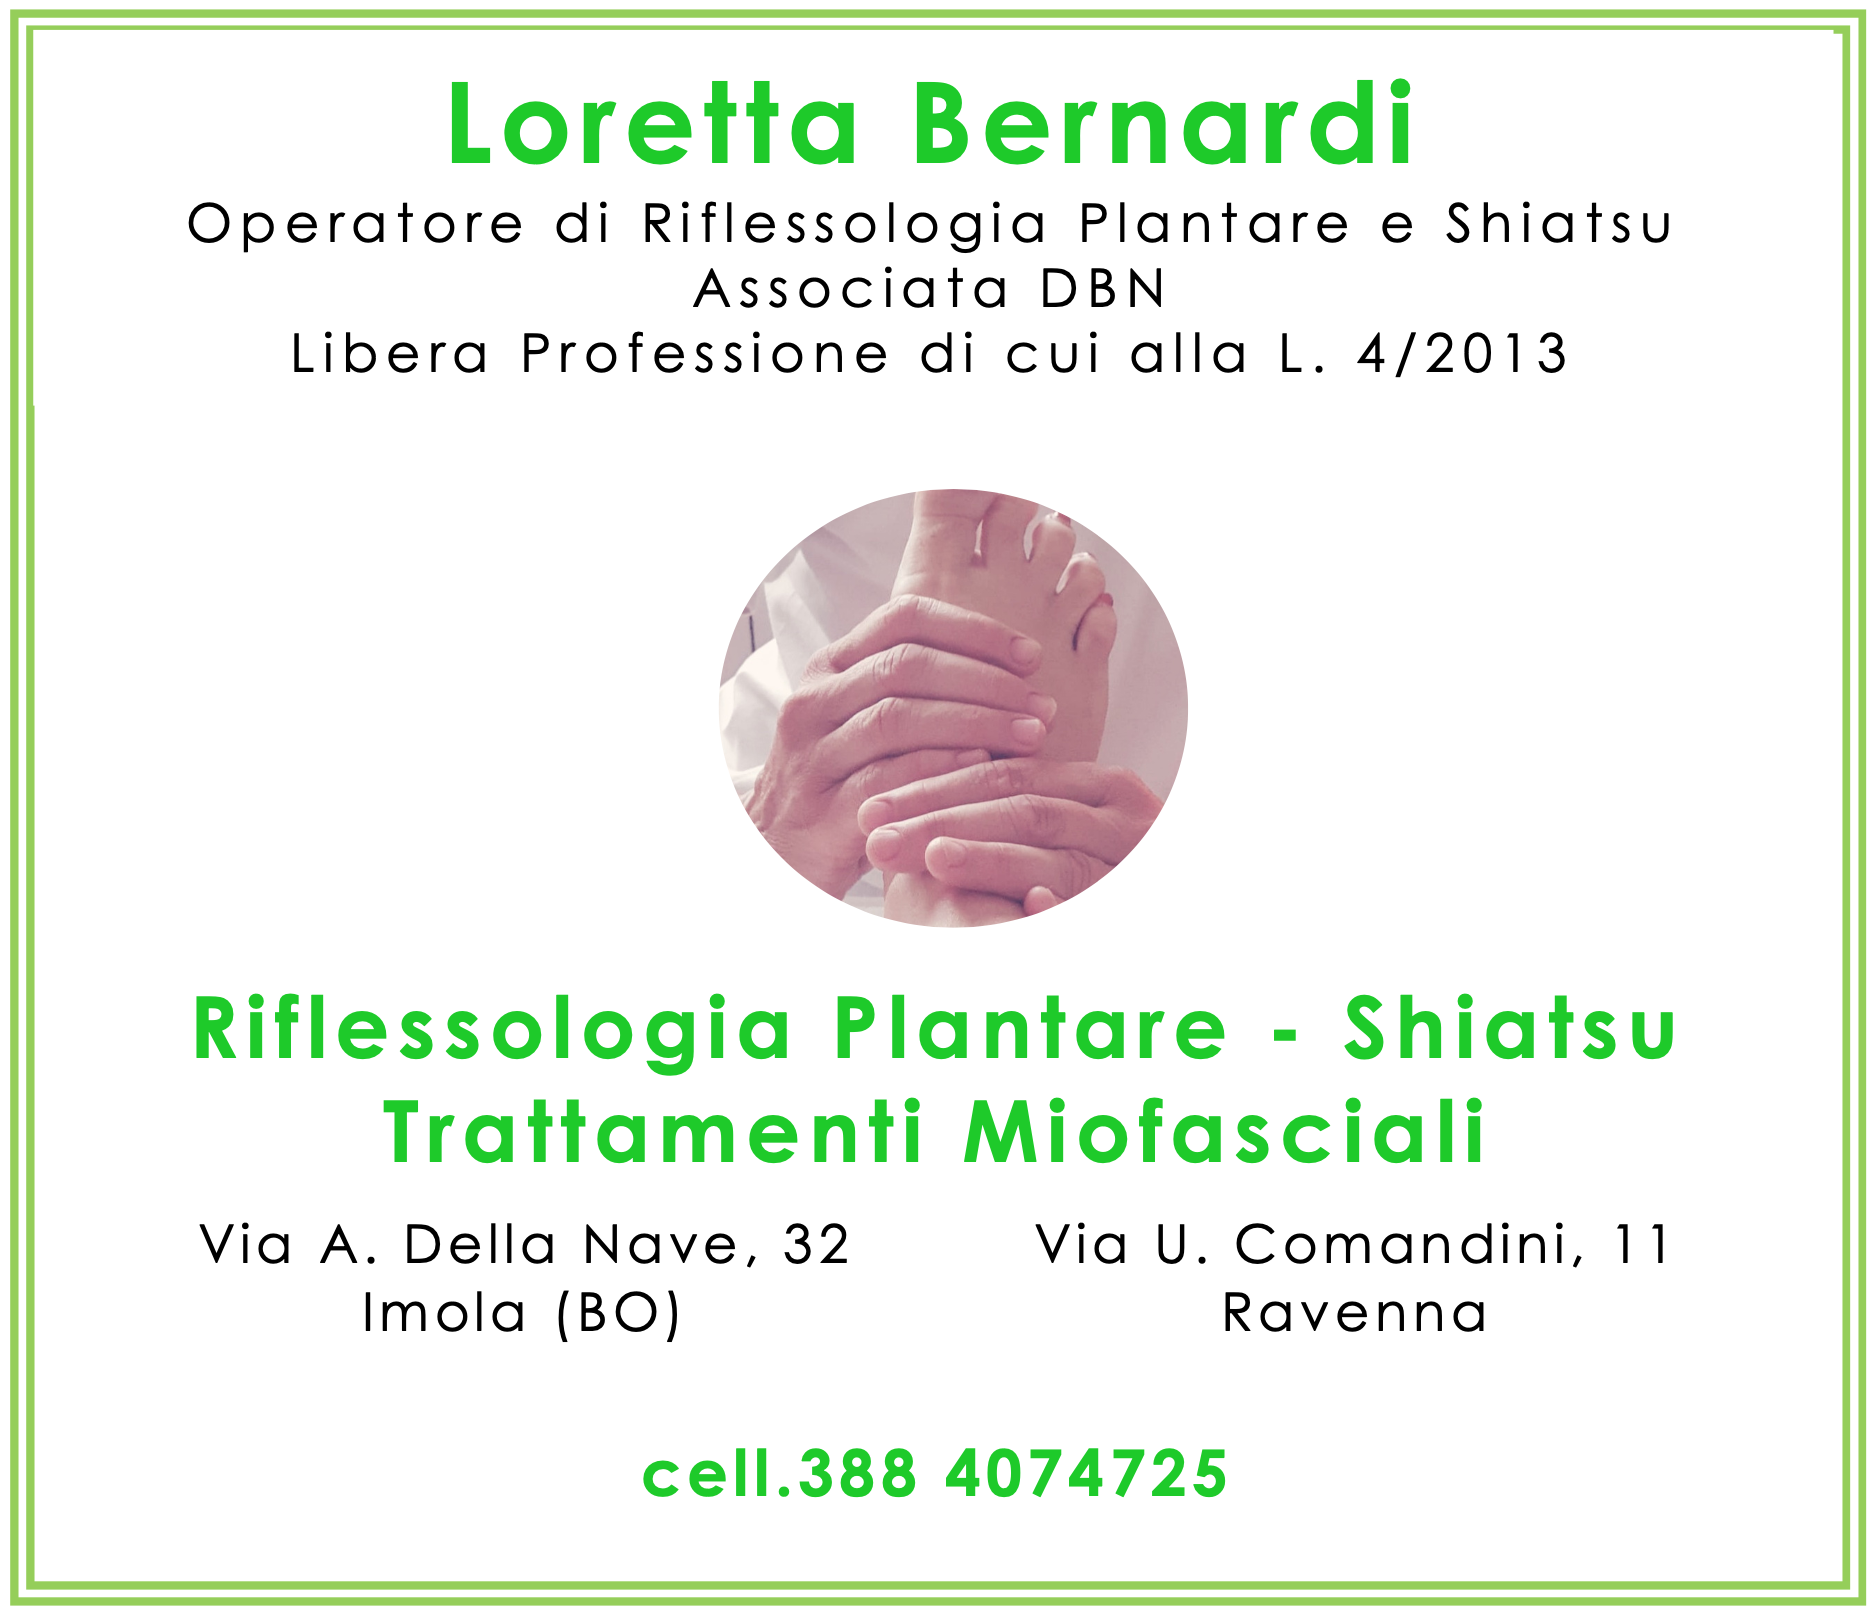 brenardi-loretta